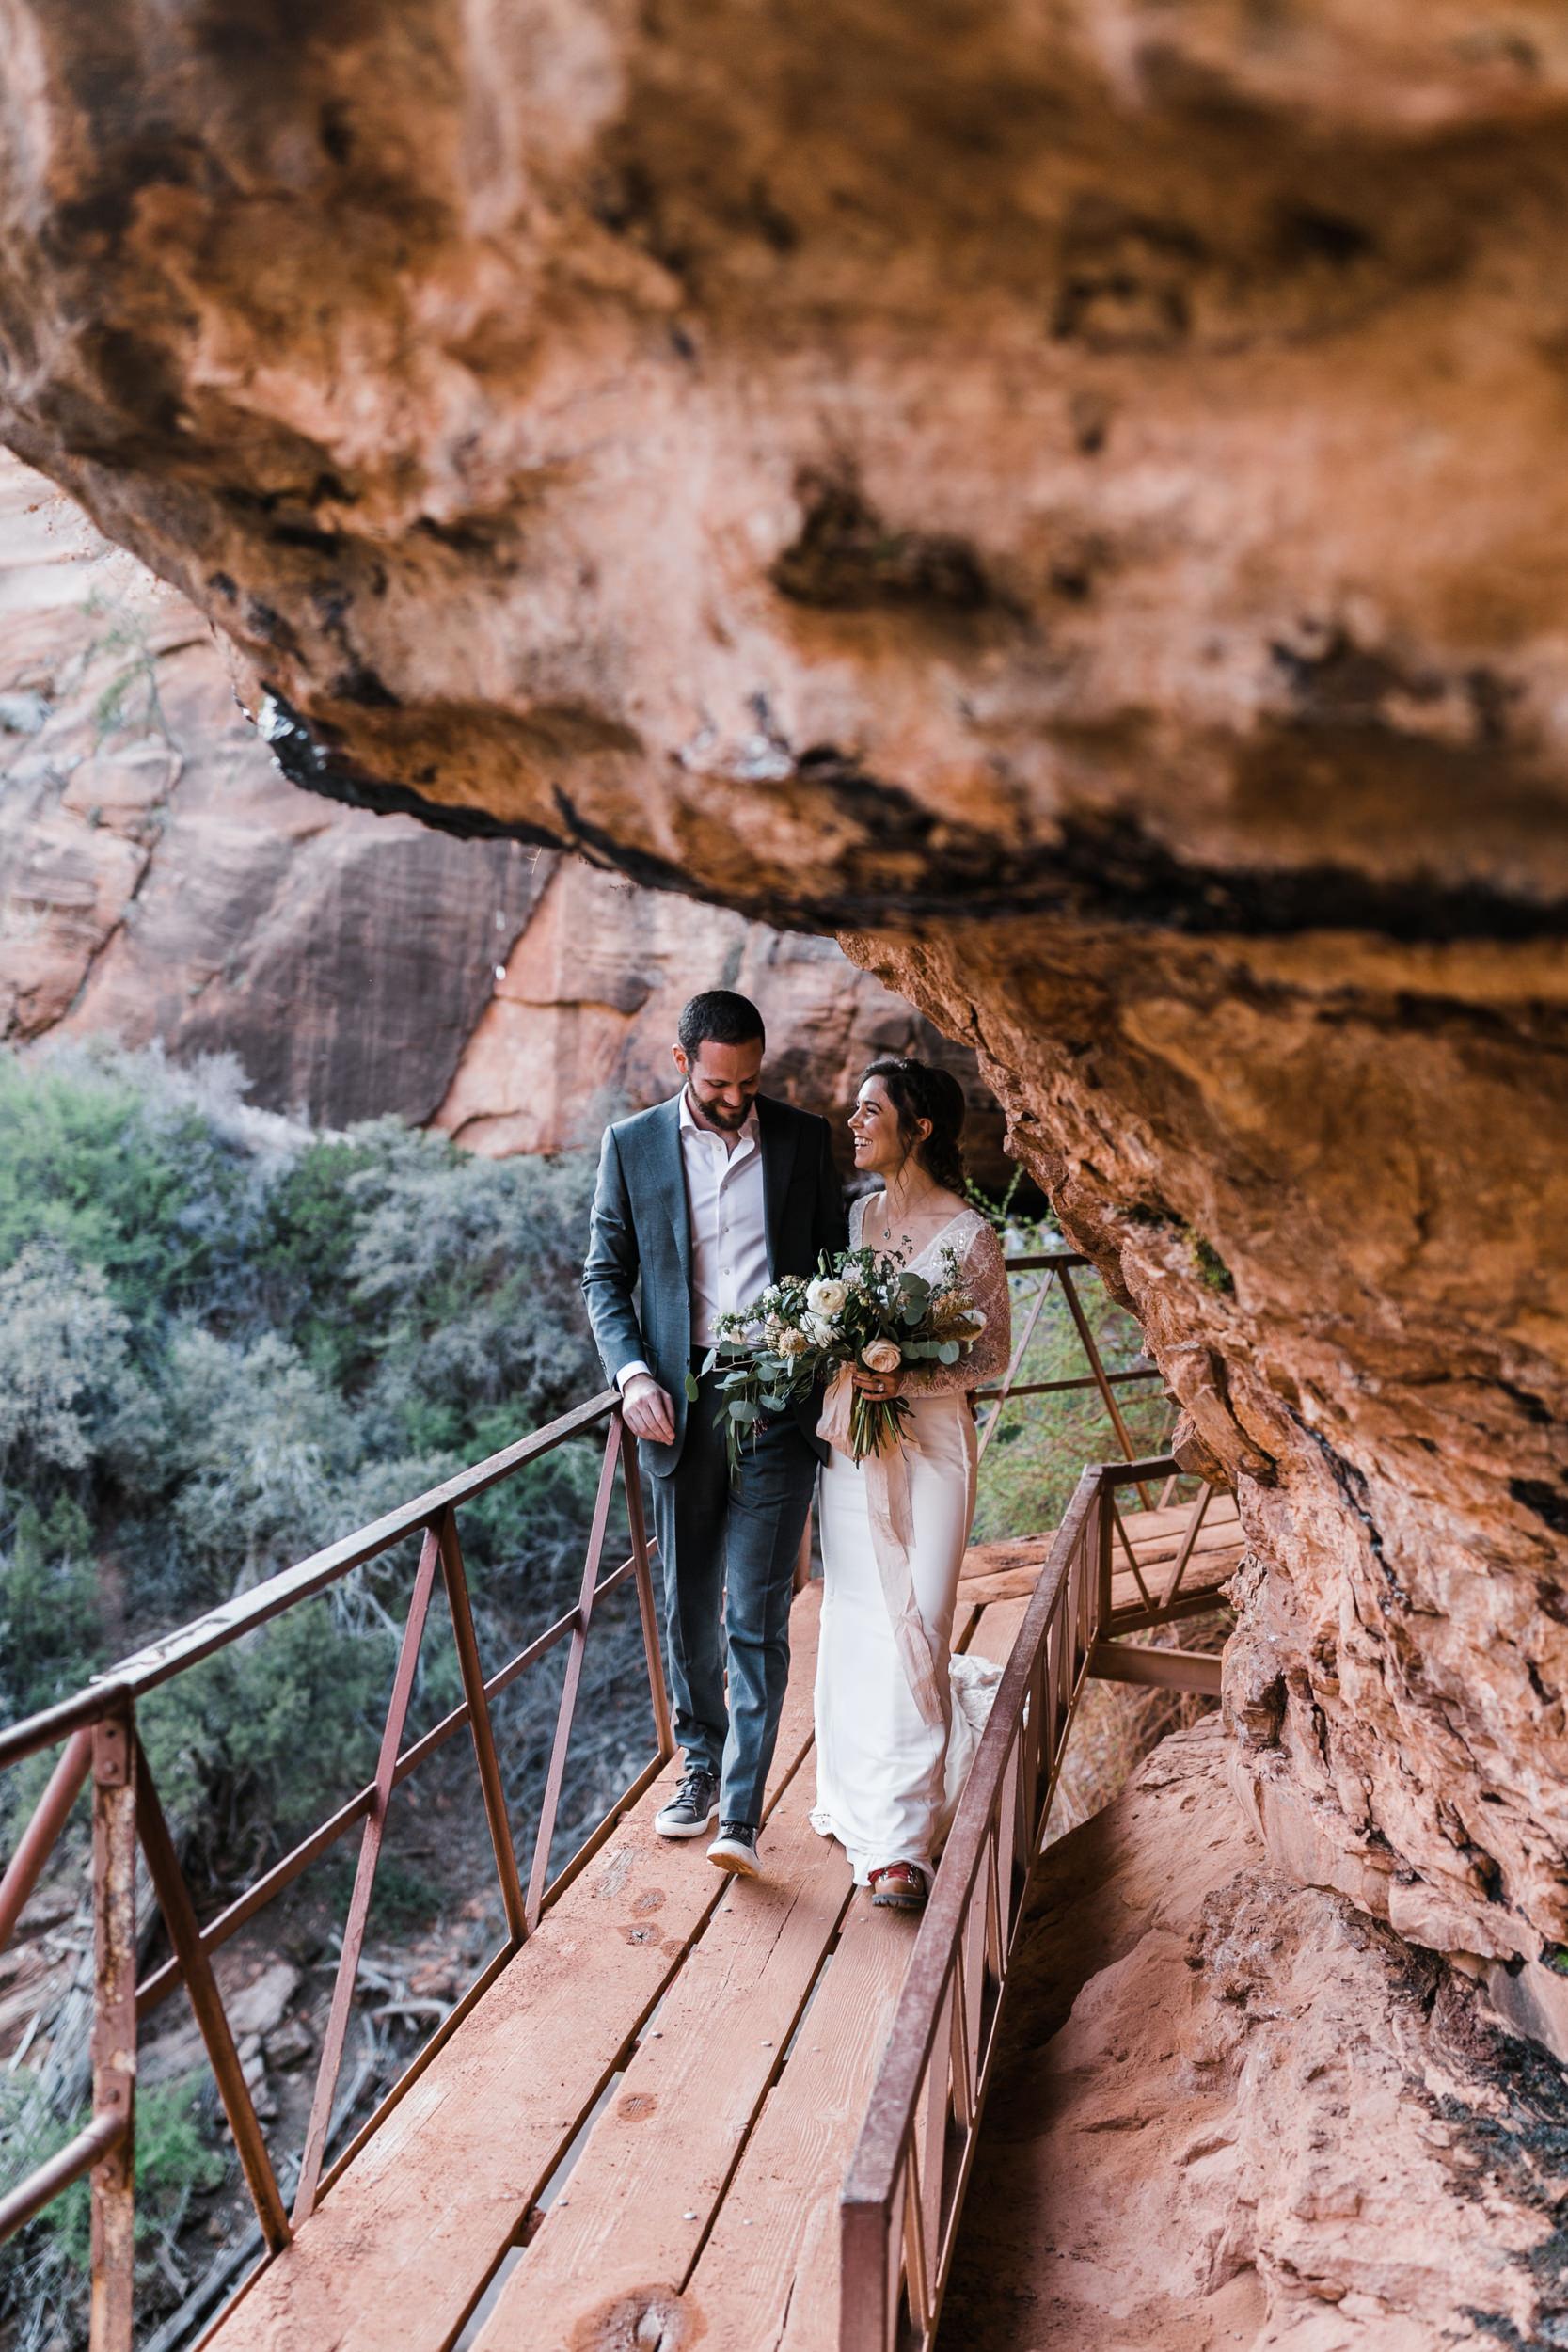 Zion-National-Park-Adventure-Wedding-Hearnes-Elopement-Photography-35.jpg